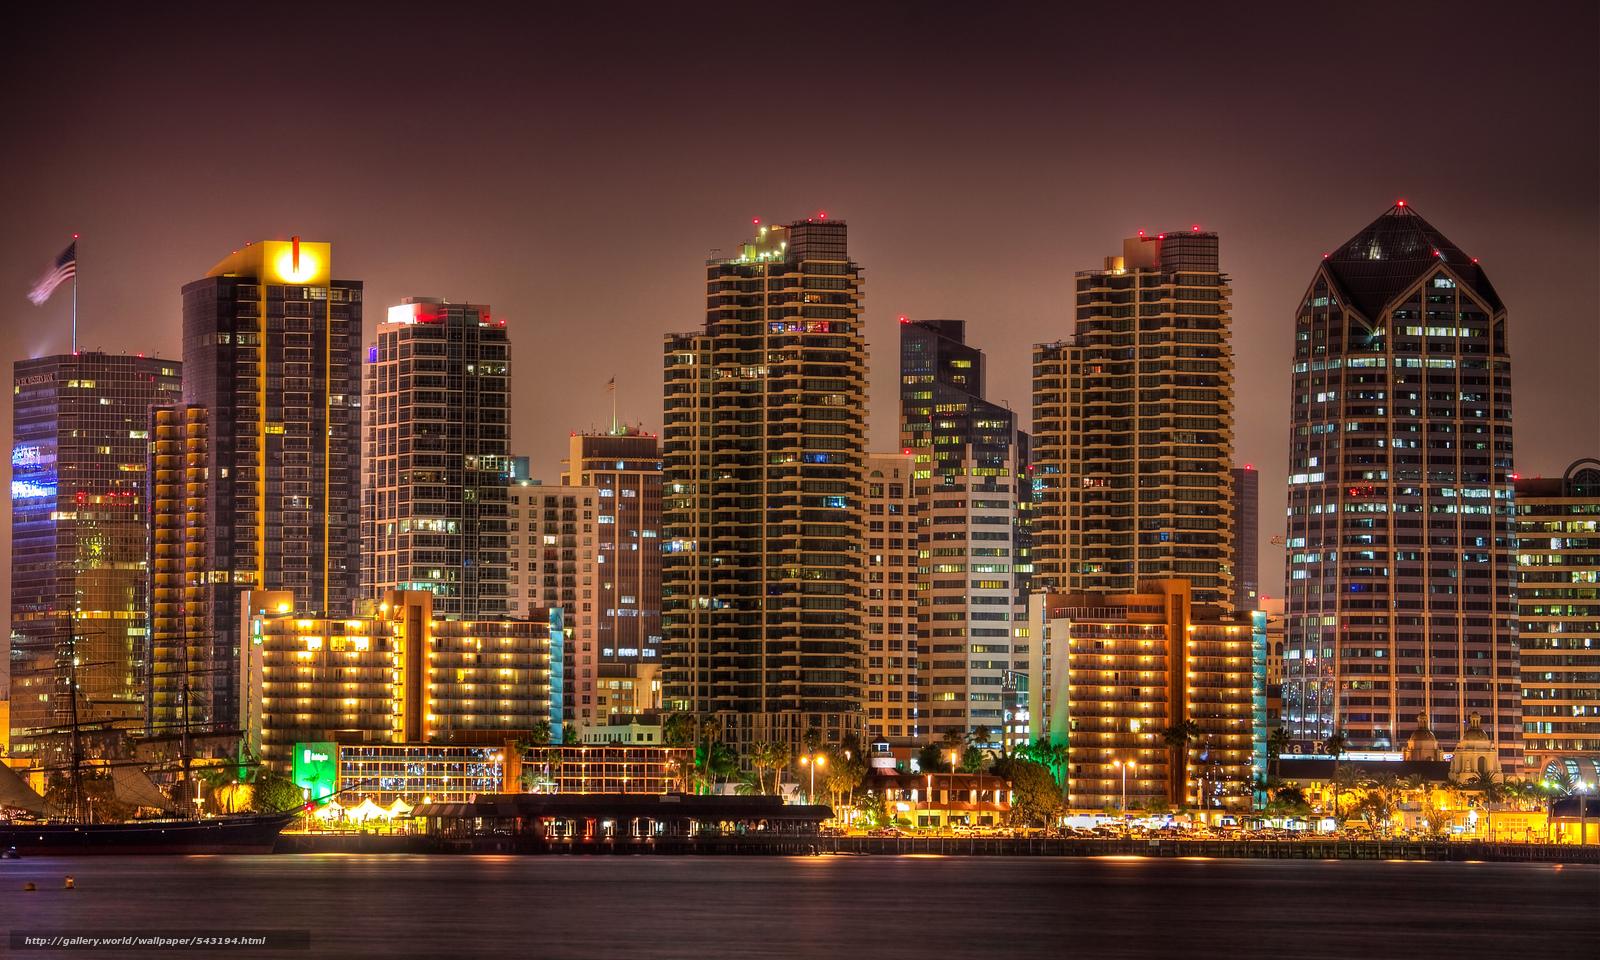 wallpaper San Diego city night lights desktop wallpaper 1600x960